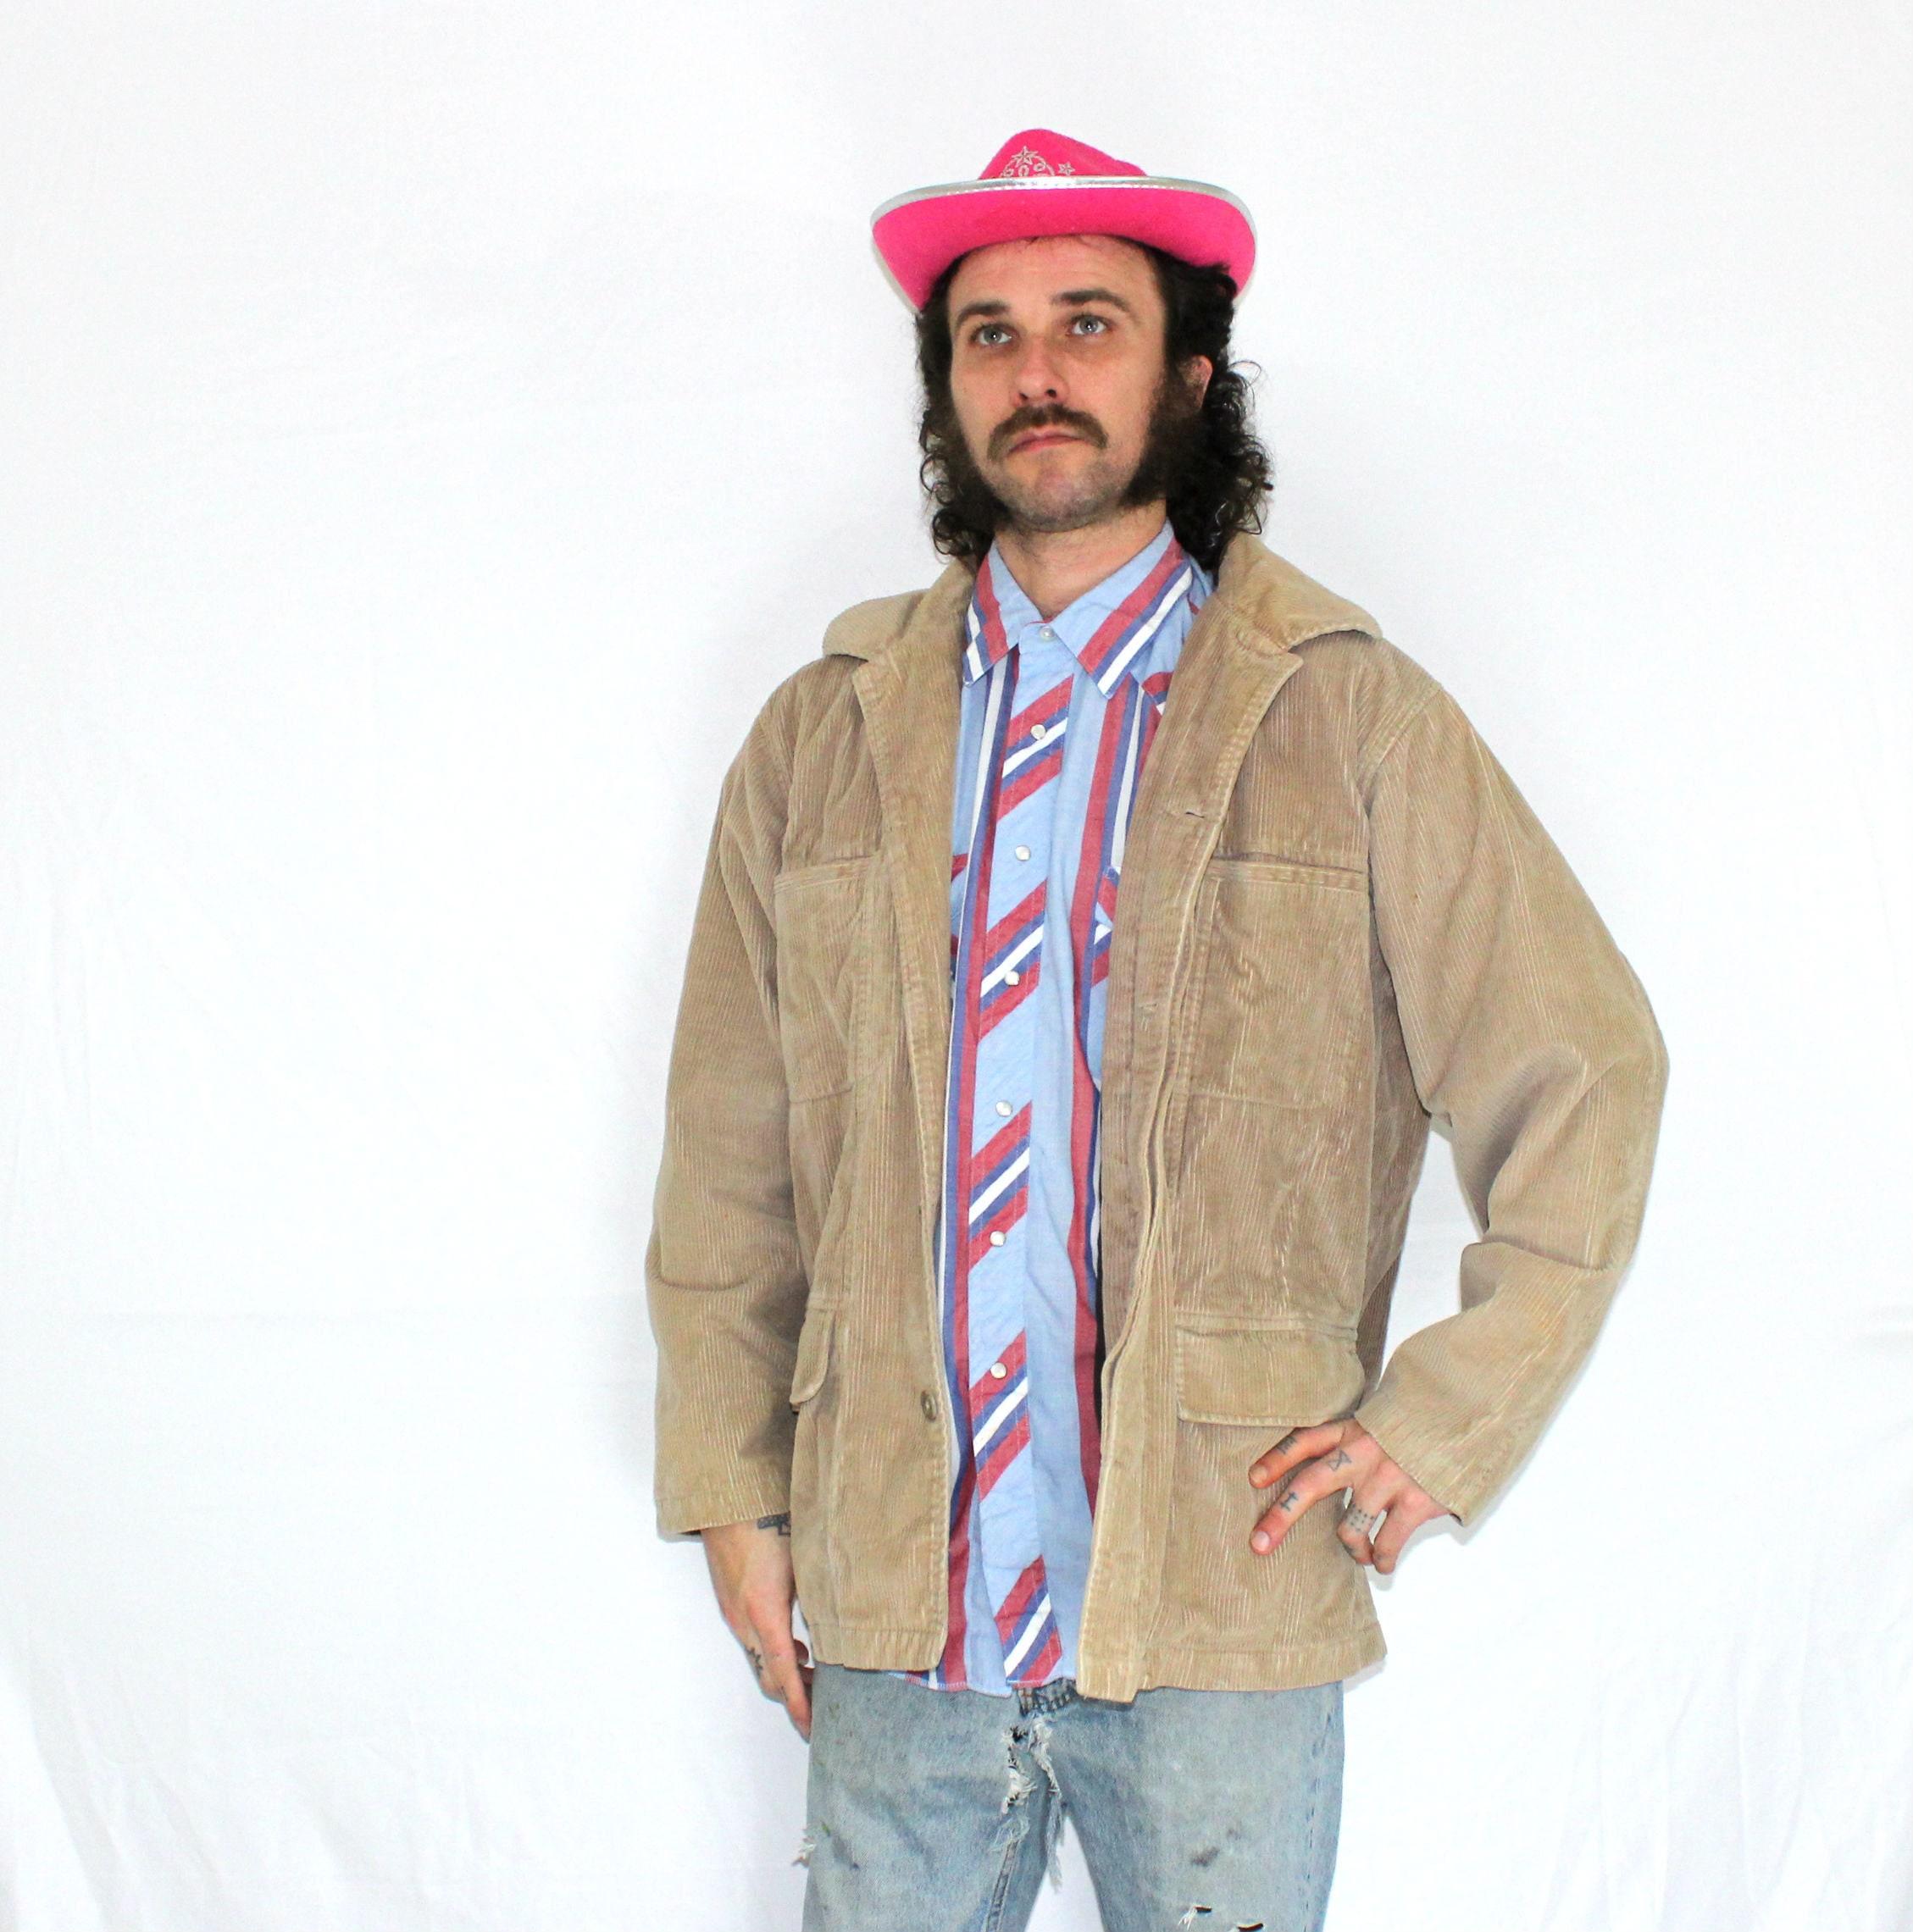 e6362279d0a Vintage Corduroy Marlboro Men s Jacket. 90s Marlboro Man Cowboy Boho  Rancher Winter Jacket. Large Warm Marlboro Smokers Corduroy Coat